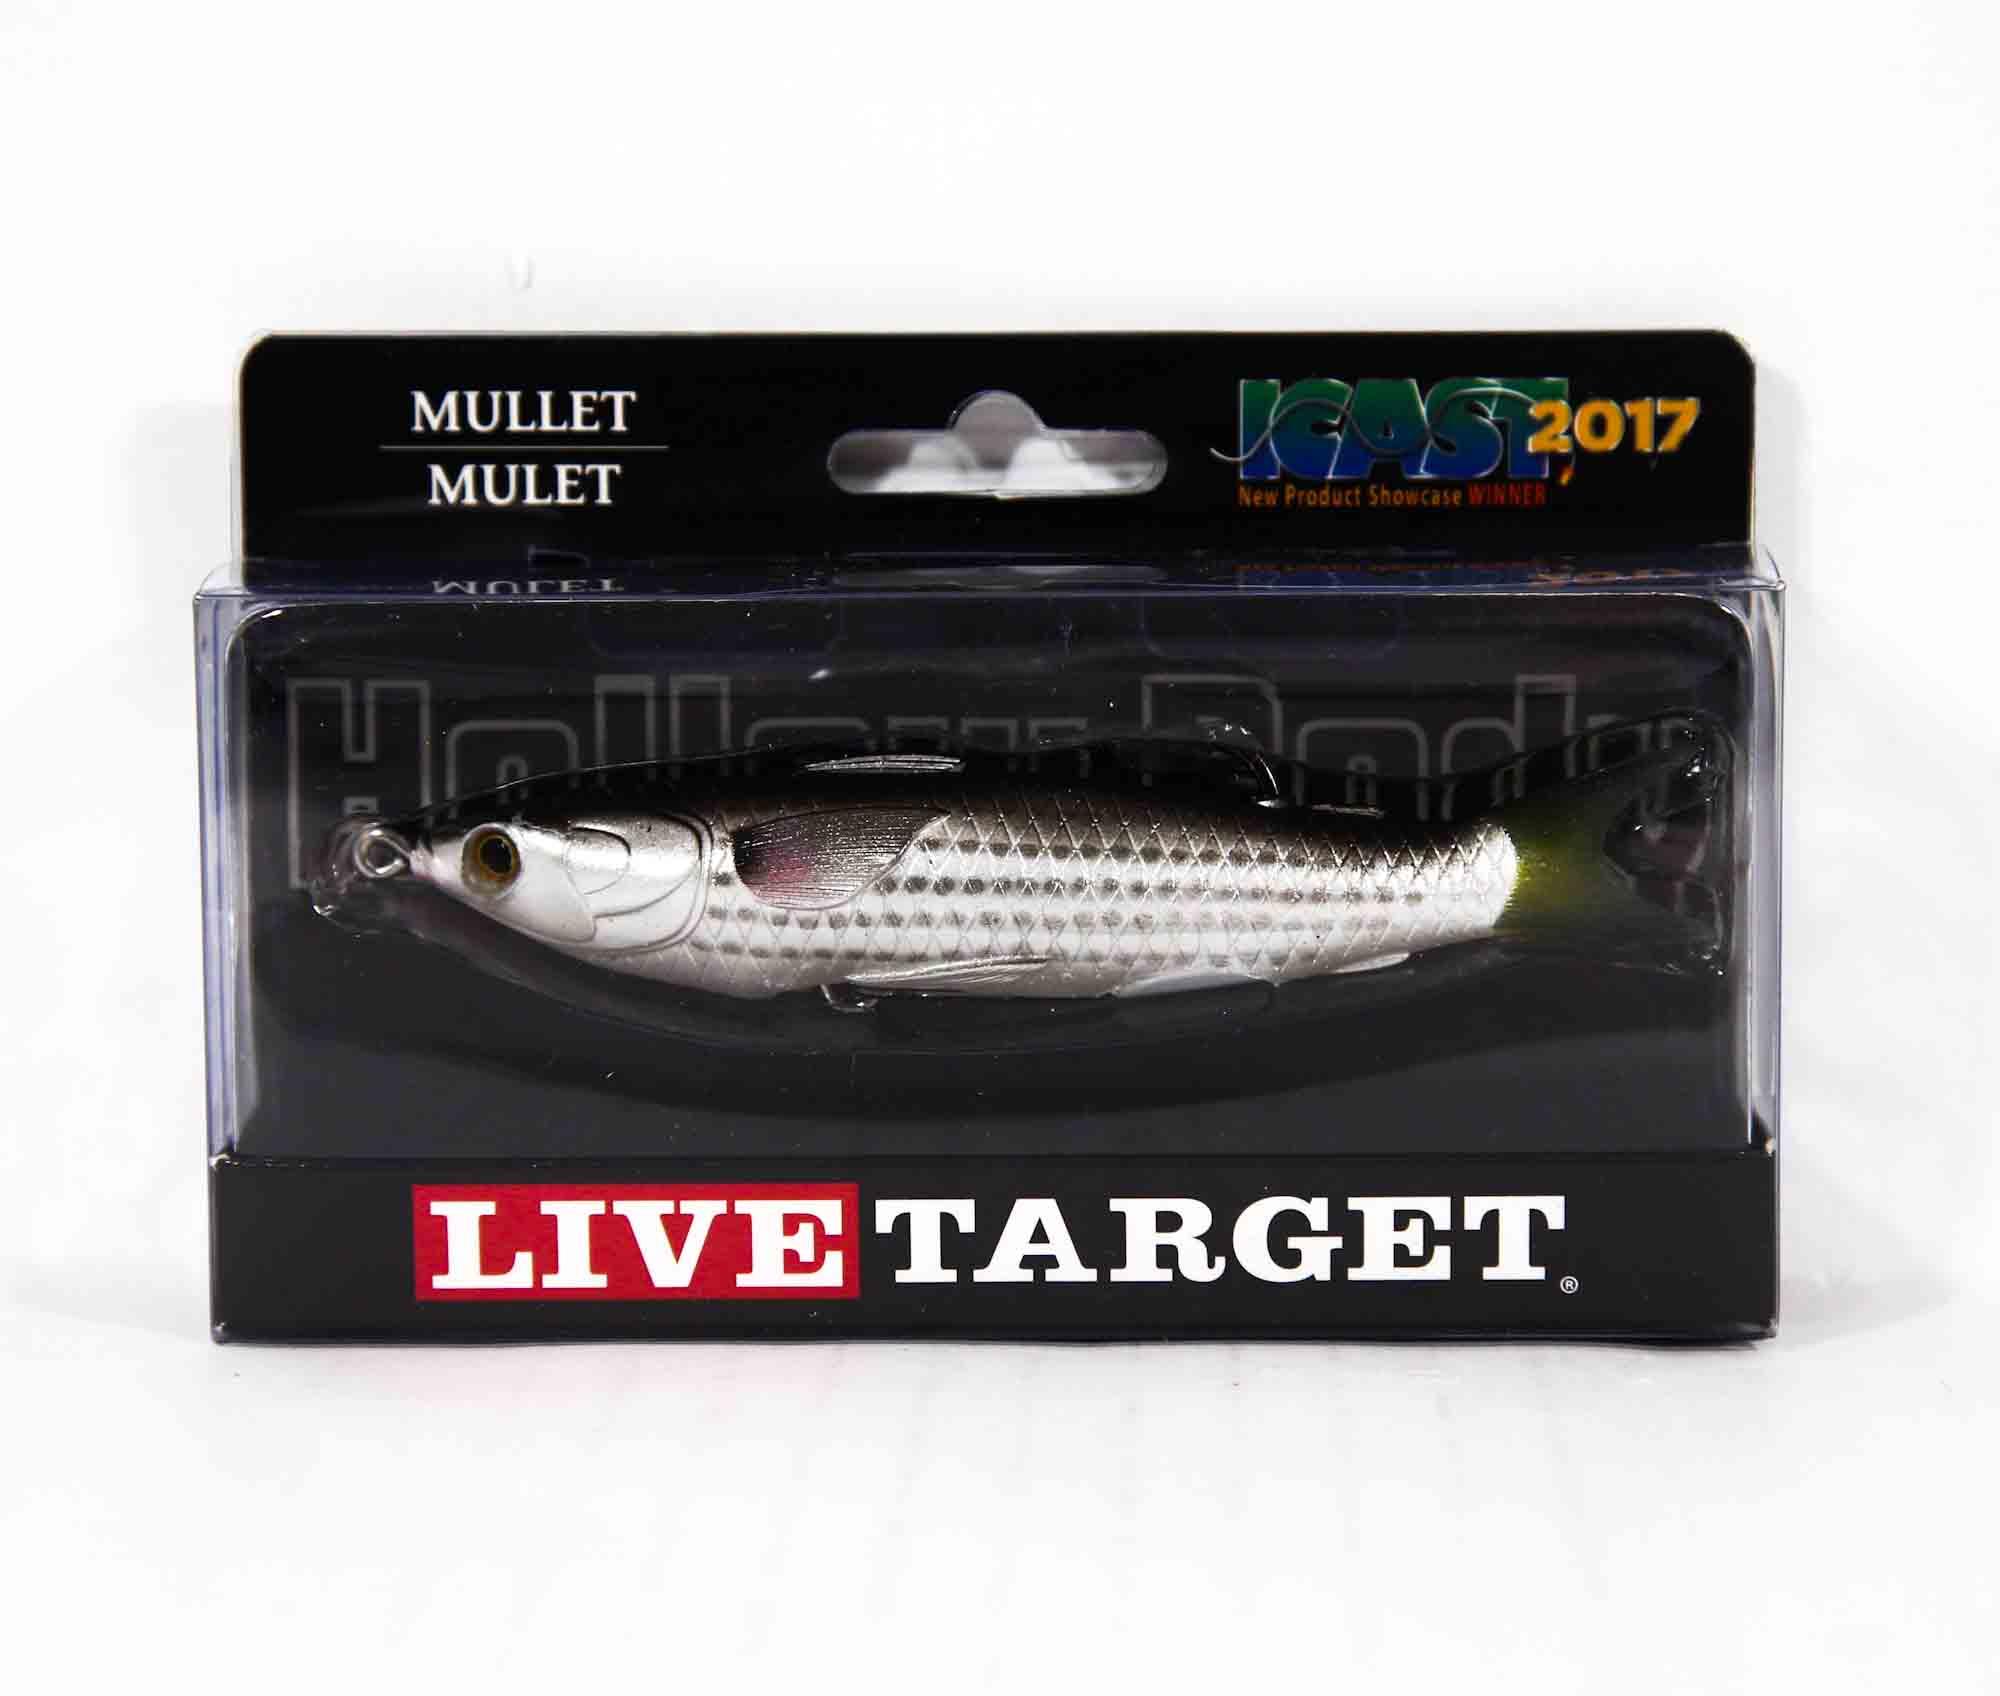 Live Target MUH115T721 Mullet Walking Bait 4.5 Inch Natural Black (0477)